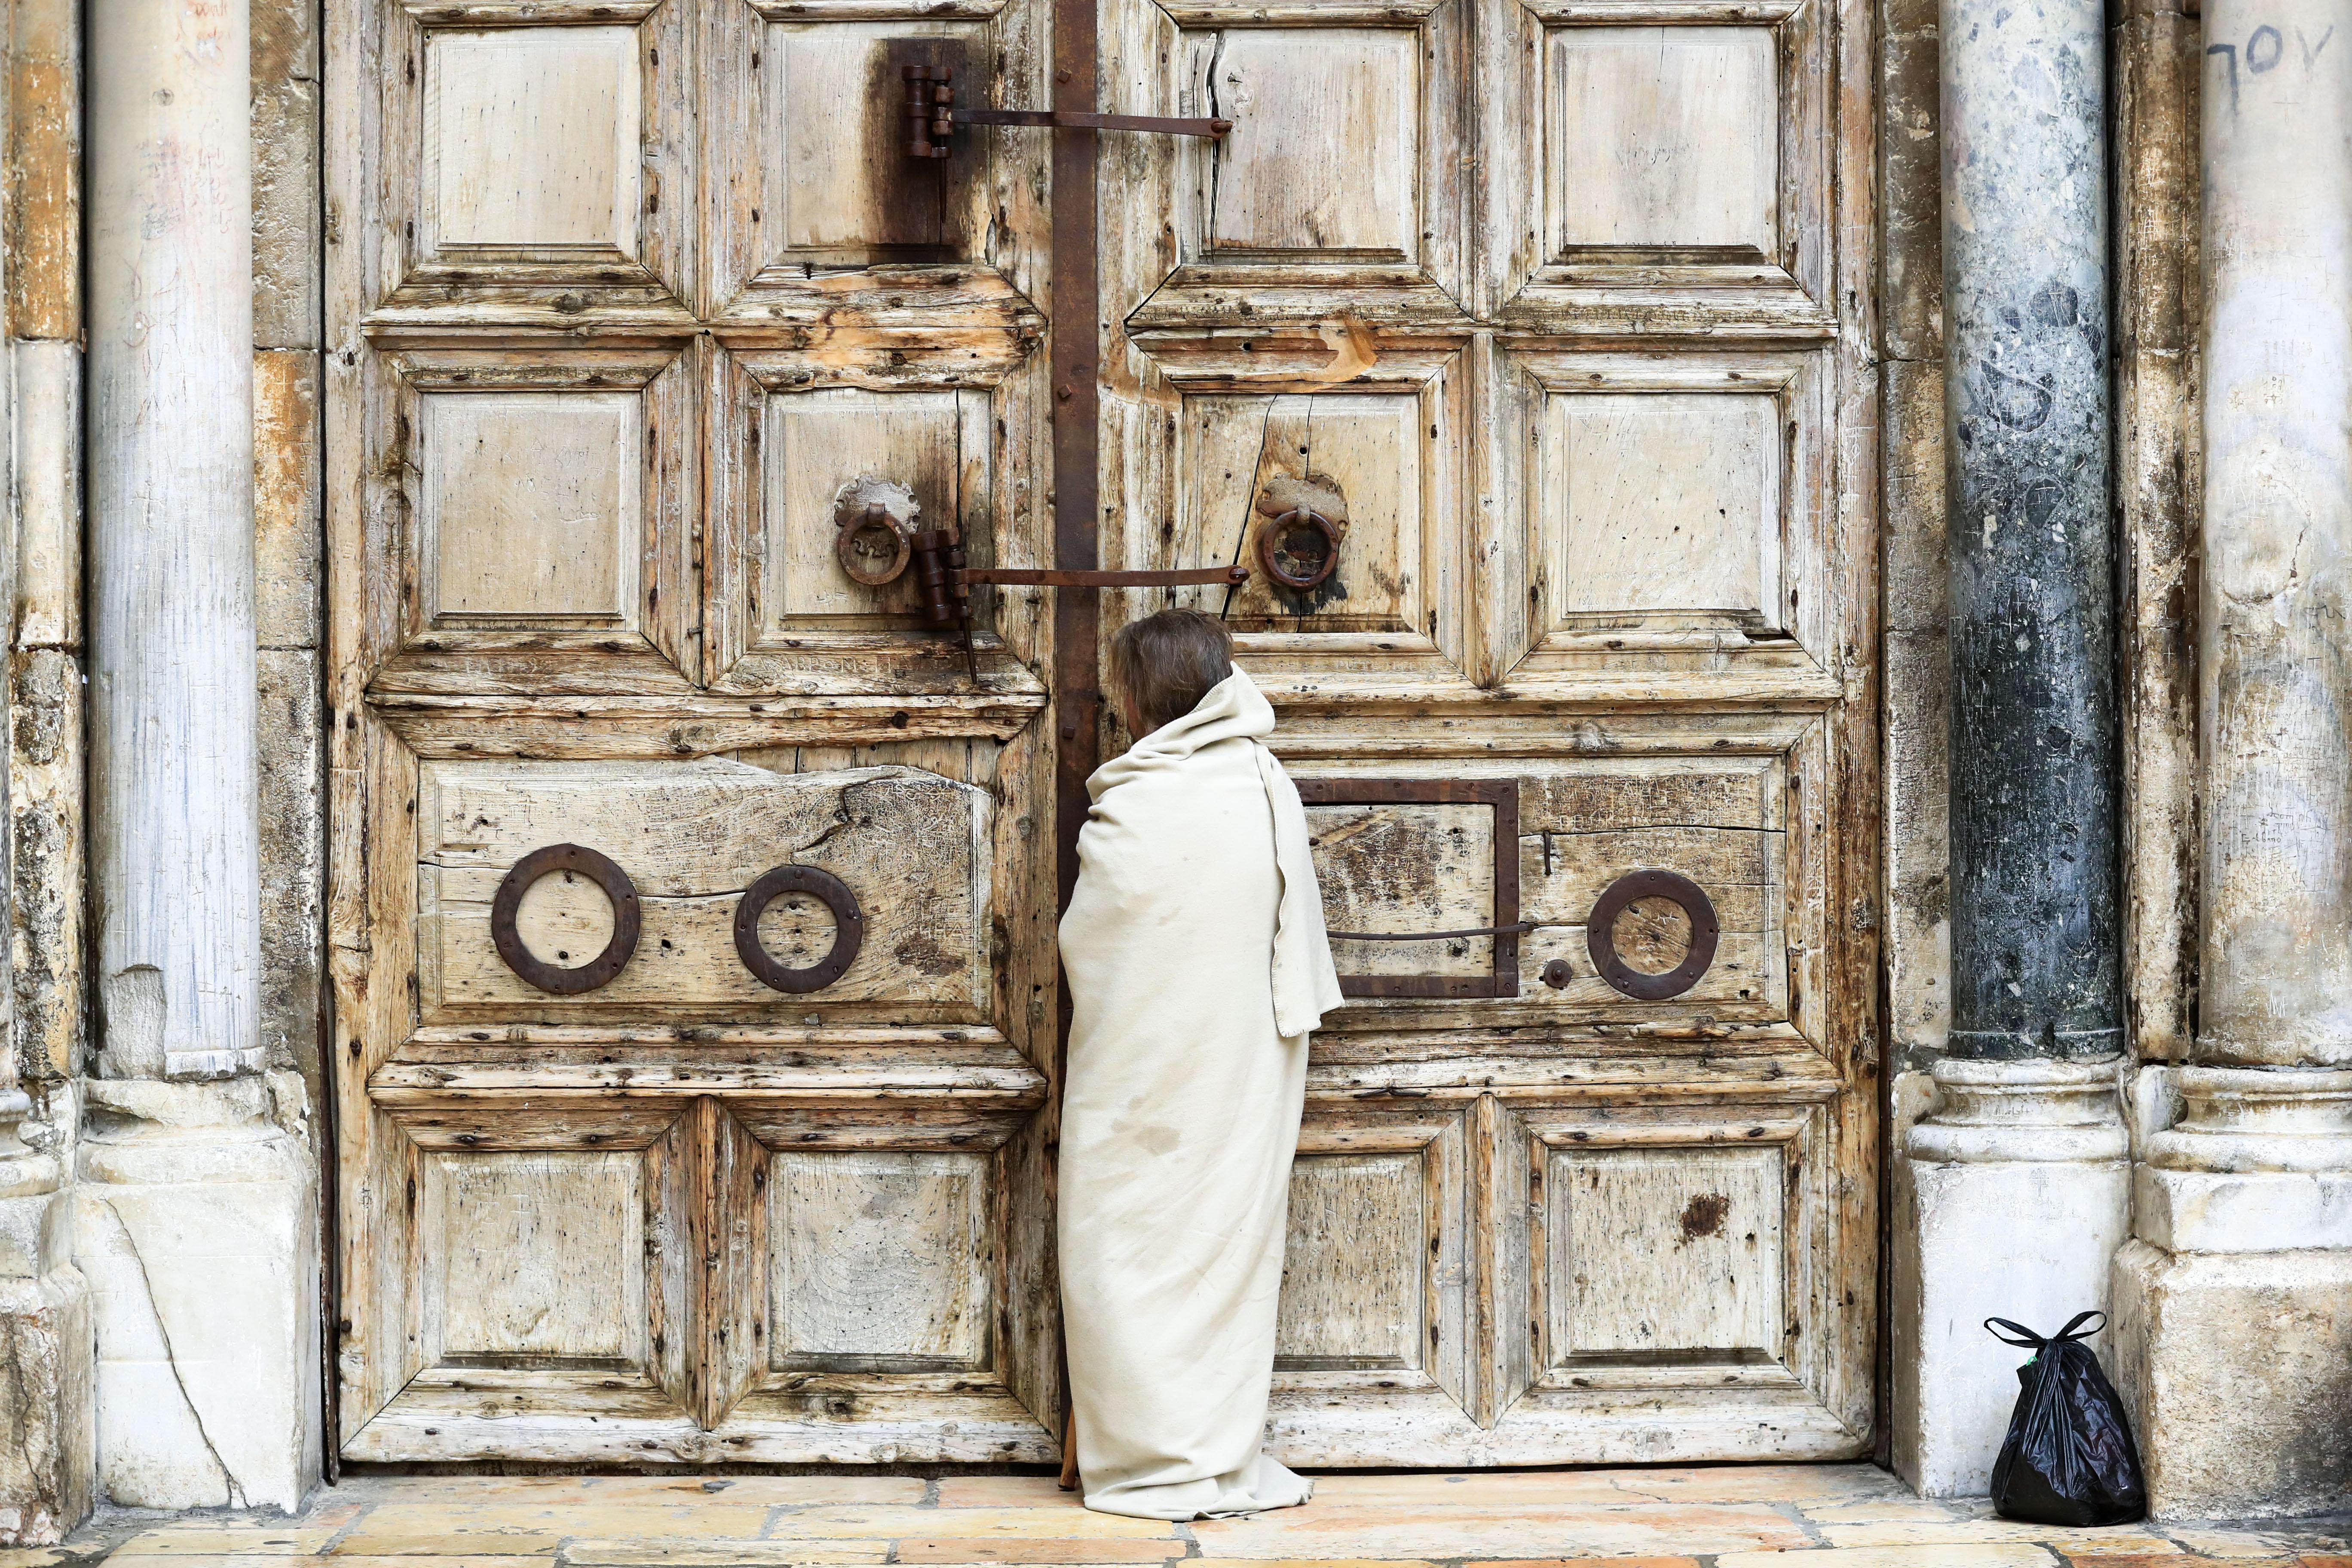 'A sad city': A solemn Easter for Christians in Jerusalem amid coronavirus shutdown